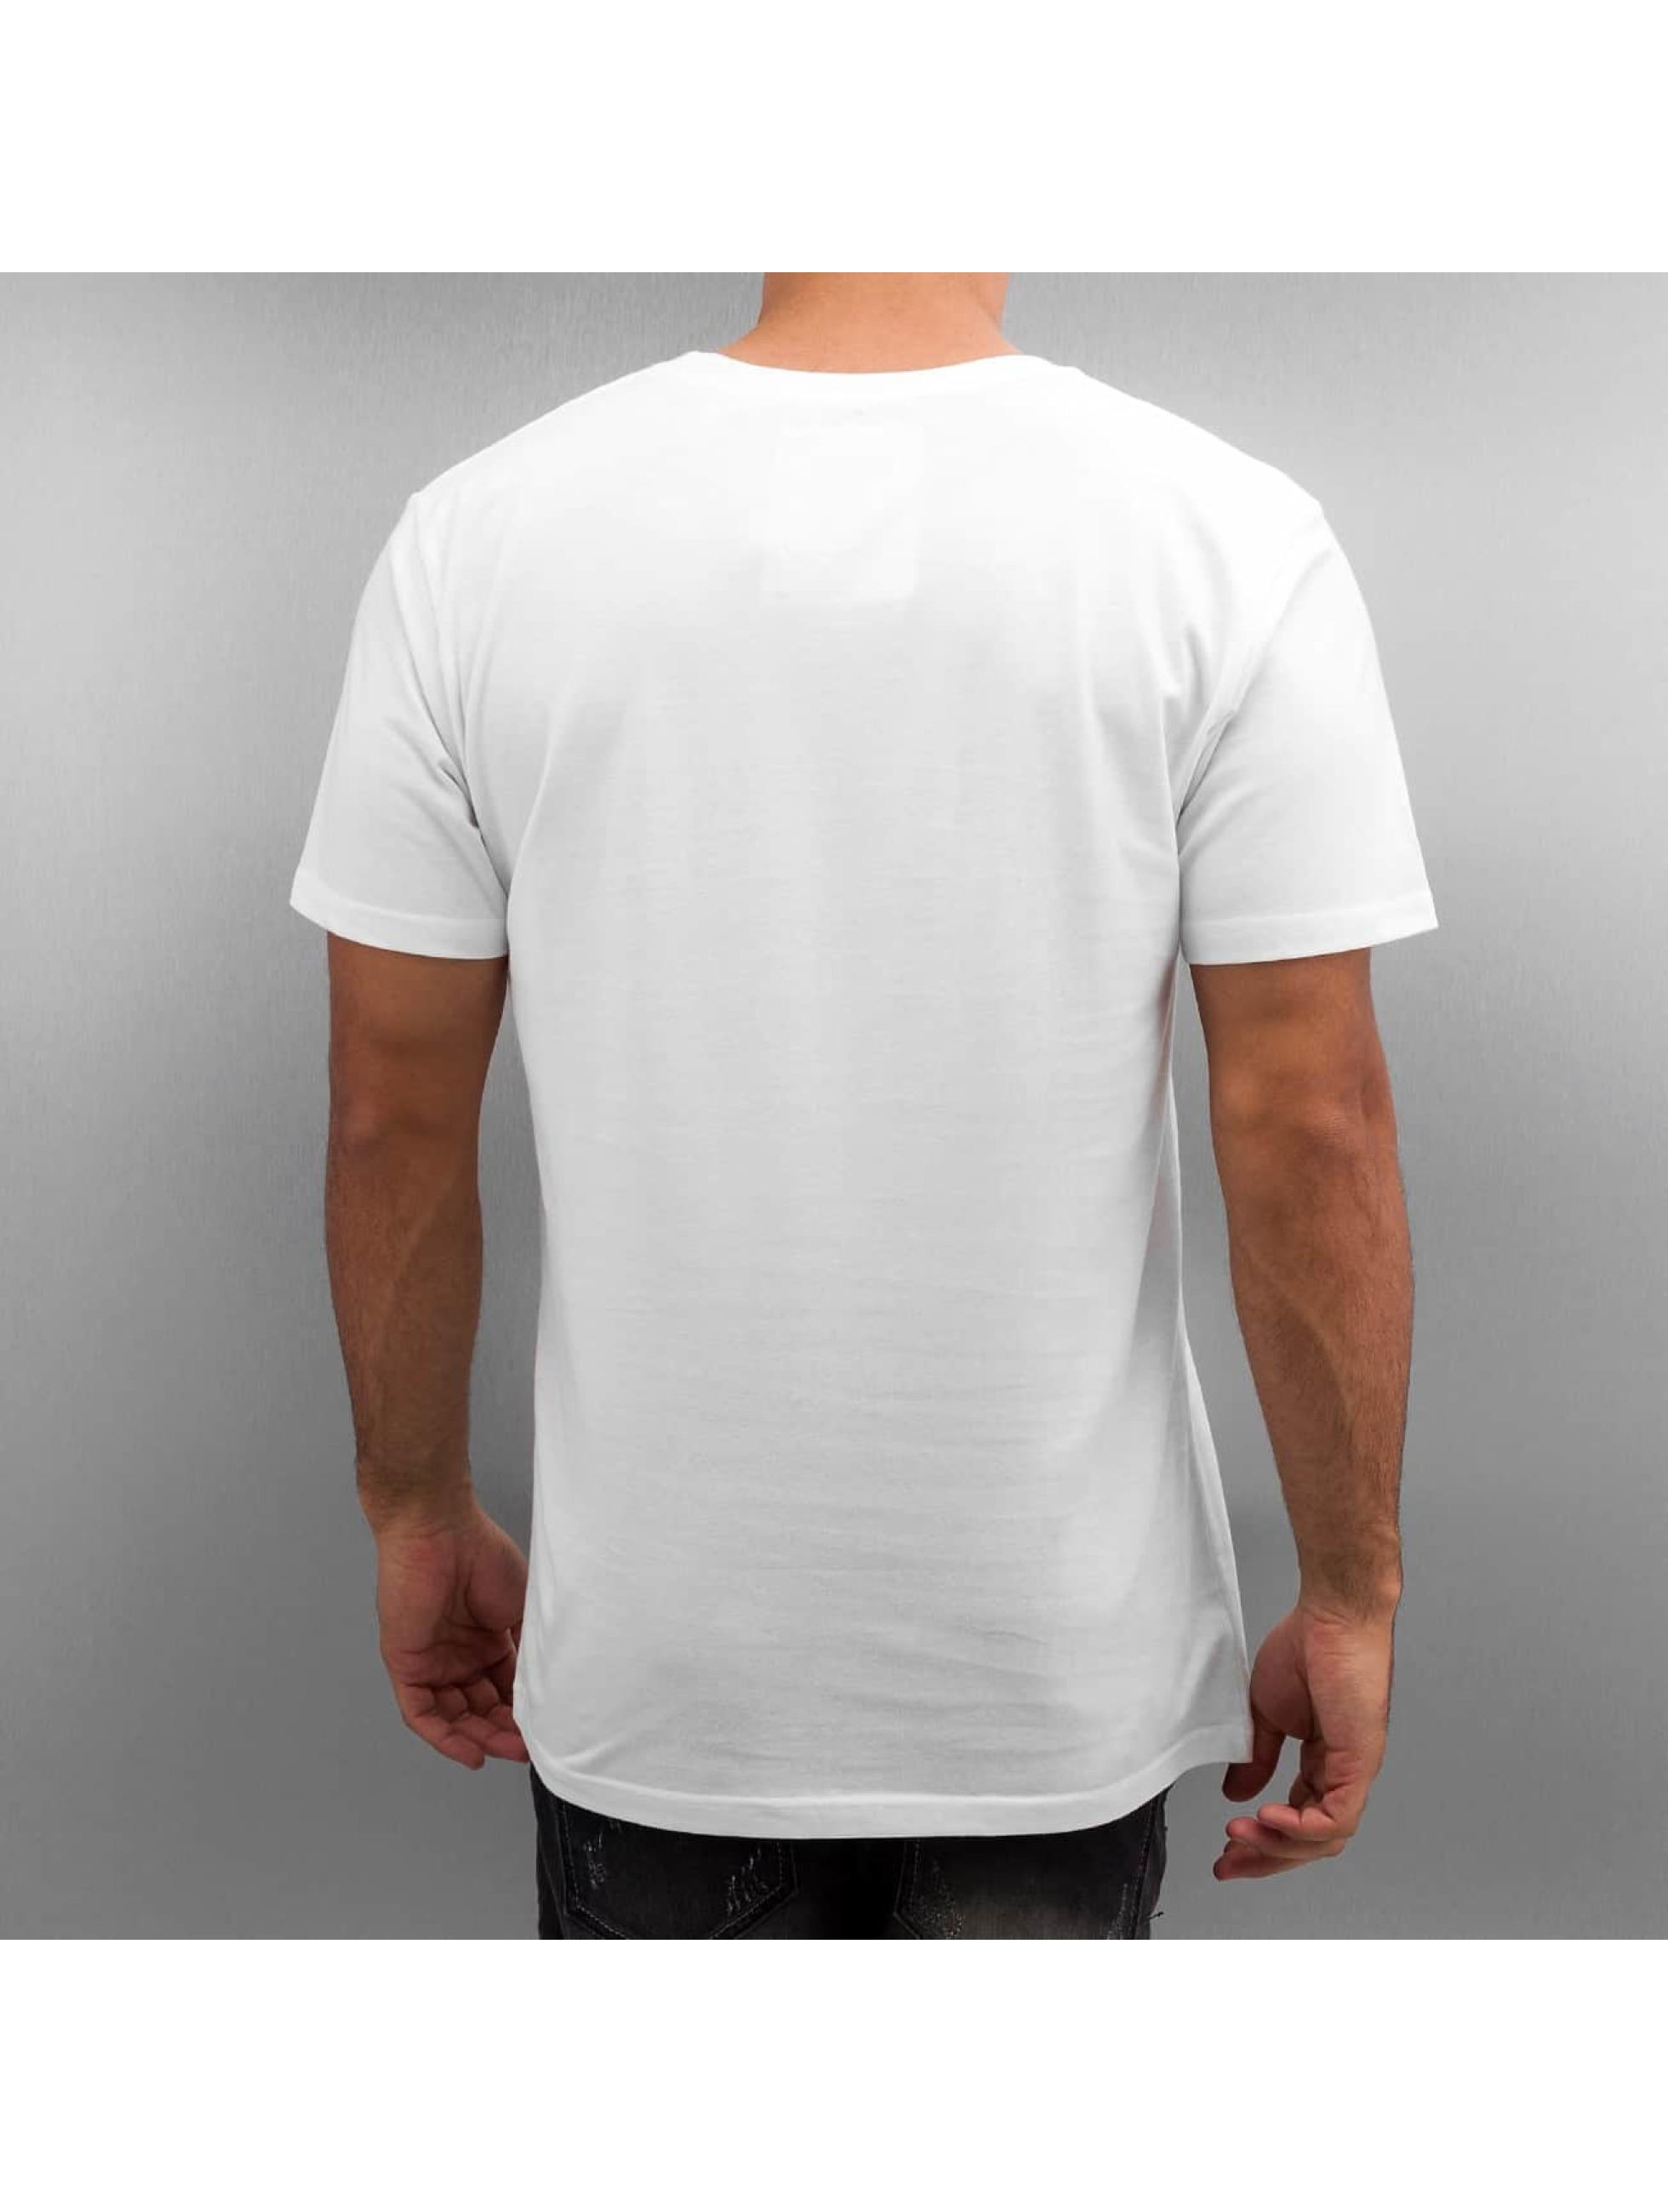 DEDICATED T-shirt Nicklas Johnson Record Head vit